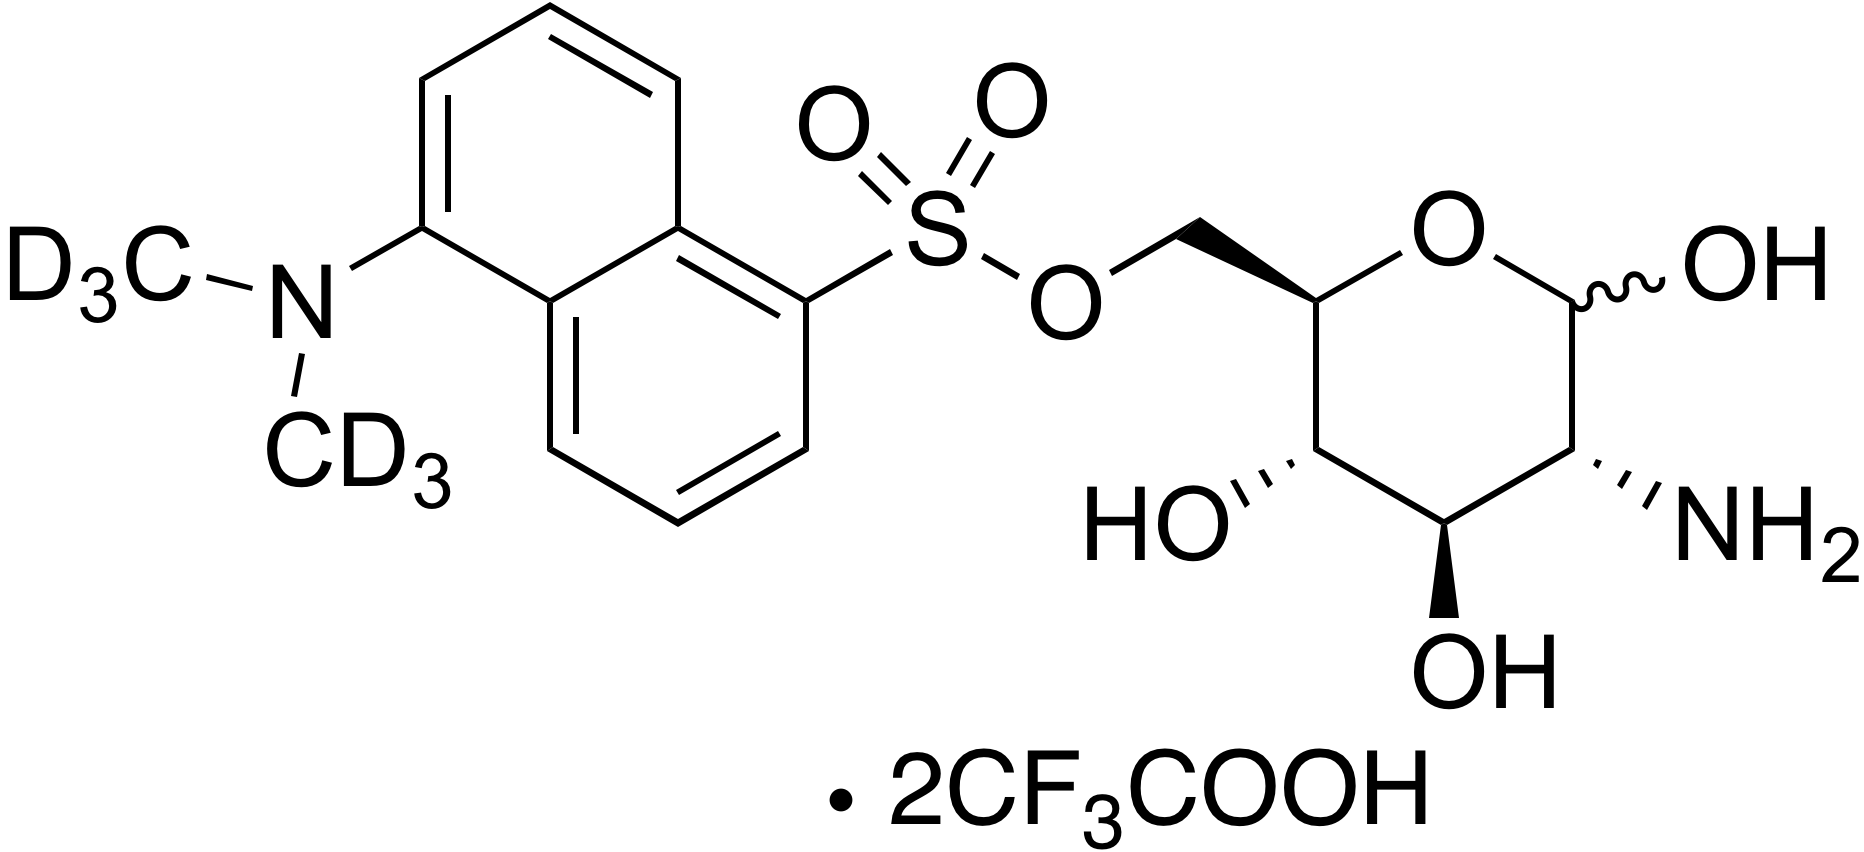 6-O-Dansyl-d<sub>6</sub>-glcosamine trifluoroacetate